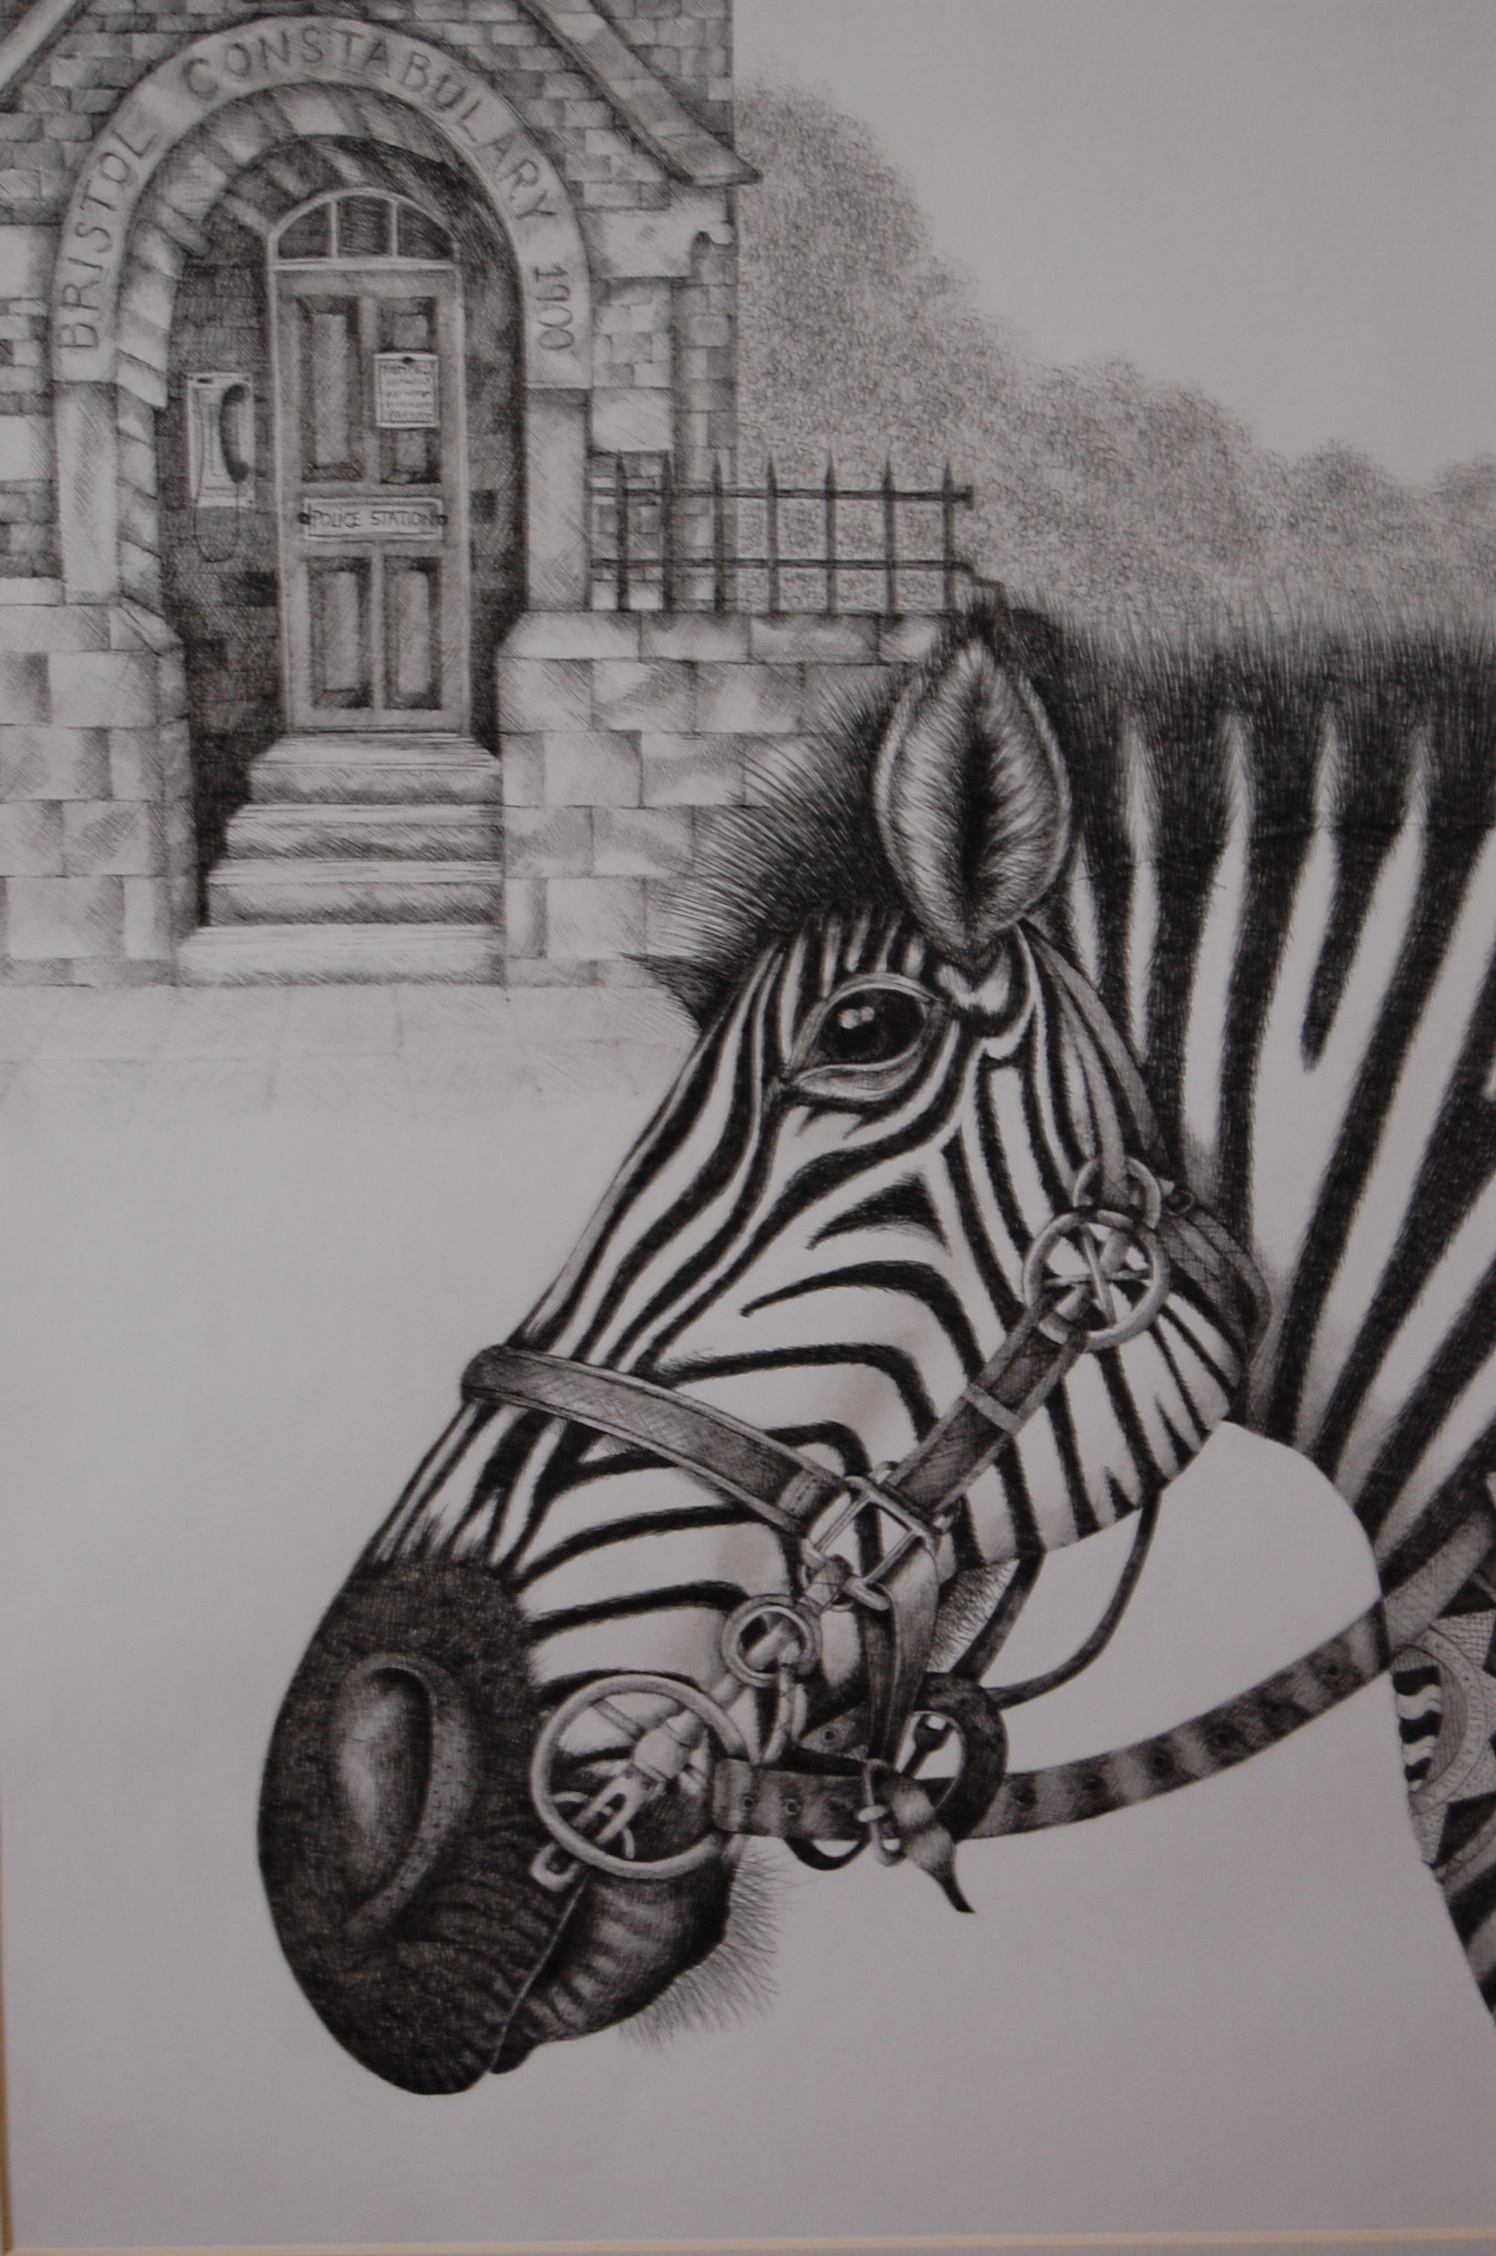 17142 || 3375 || Zebra Crossing